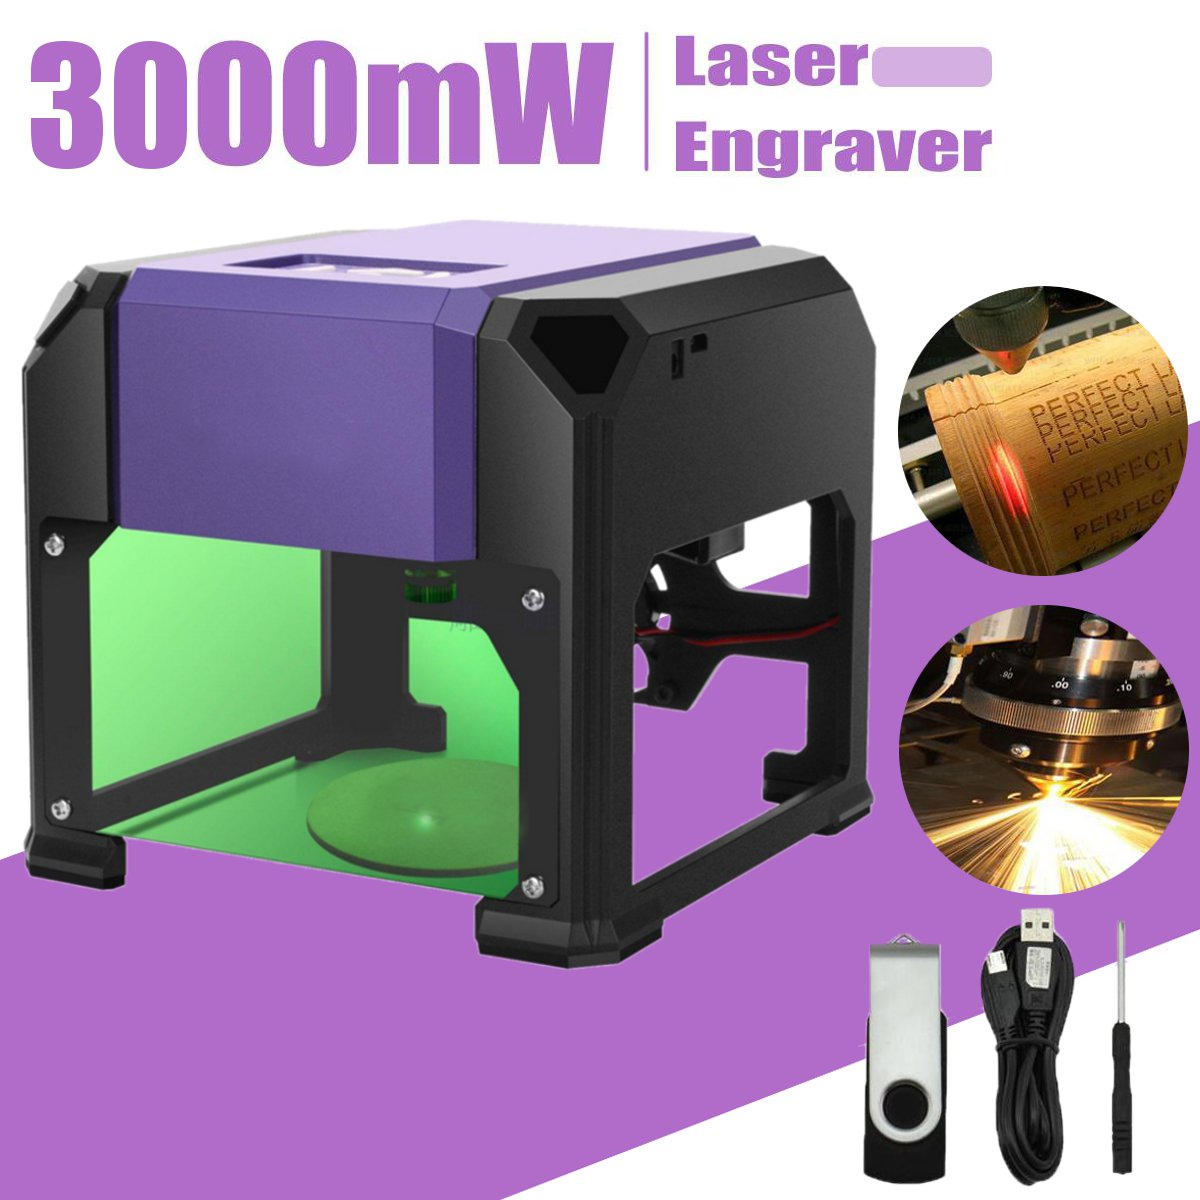 3000 mw USB Gravador de Mesa A Laser Máquina 80x80mm Gama Gravura DIY Logotipo da Marca Da Impressora Cortador A Laser CNC cinzelando a Máquina